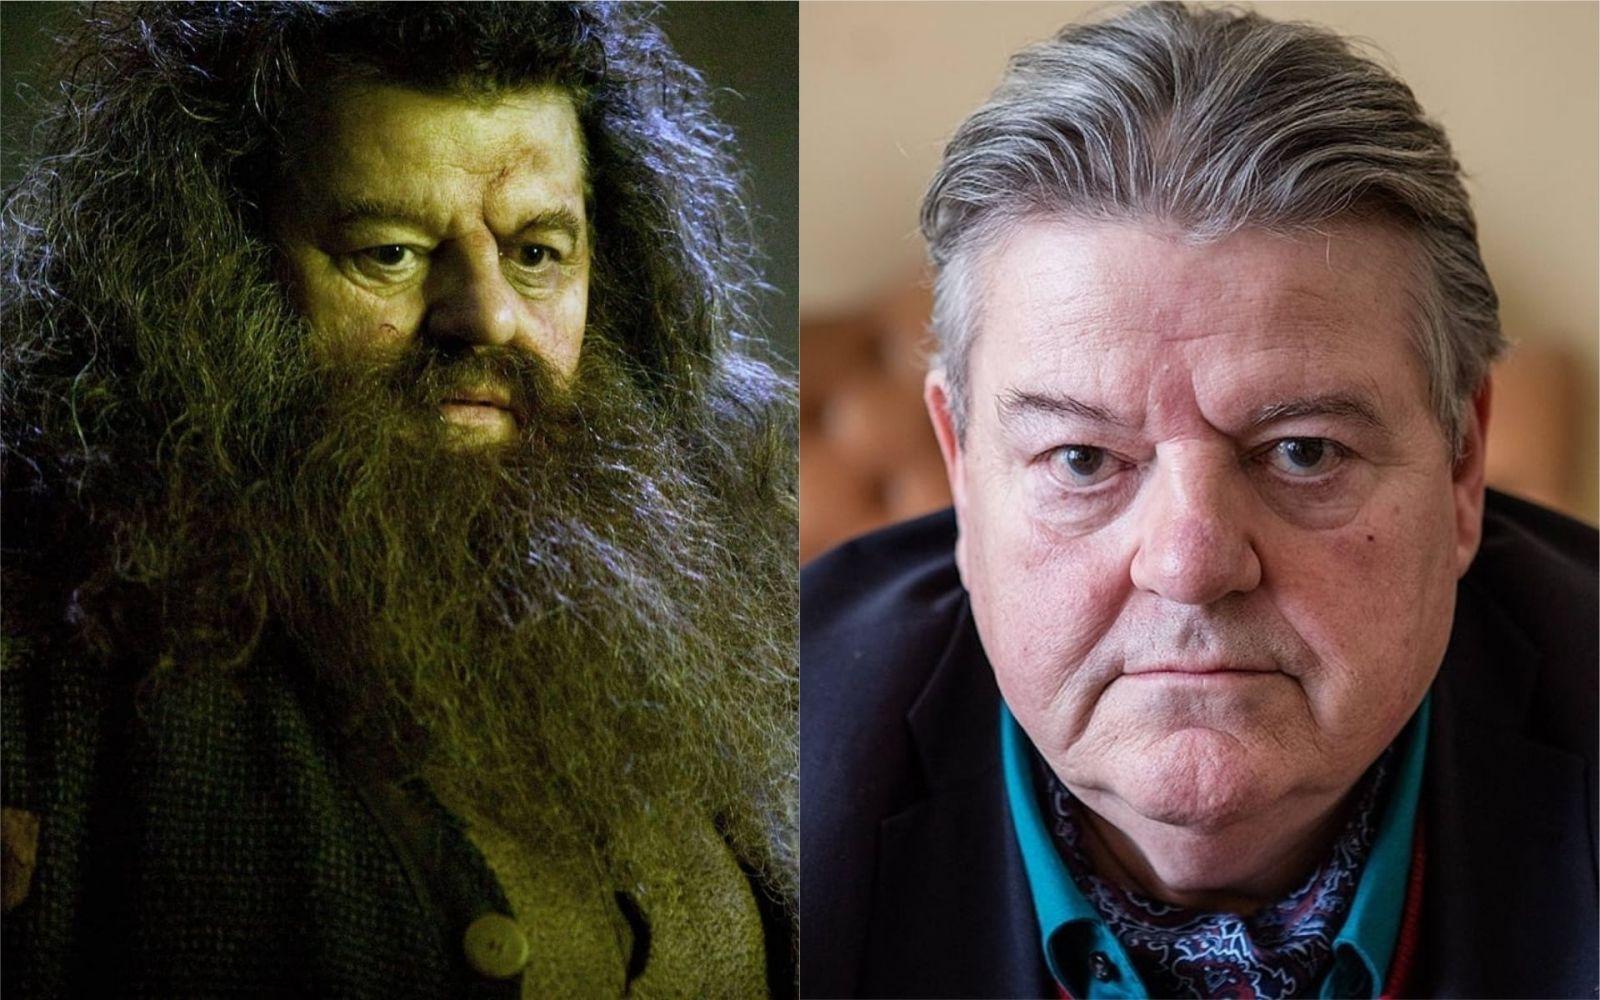 Rubeus Hagrid/Robbie Coltrane